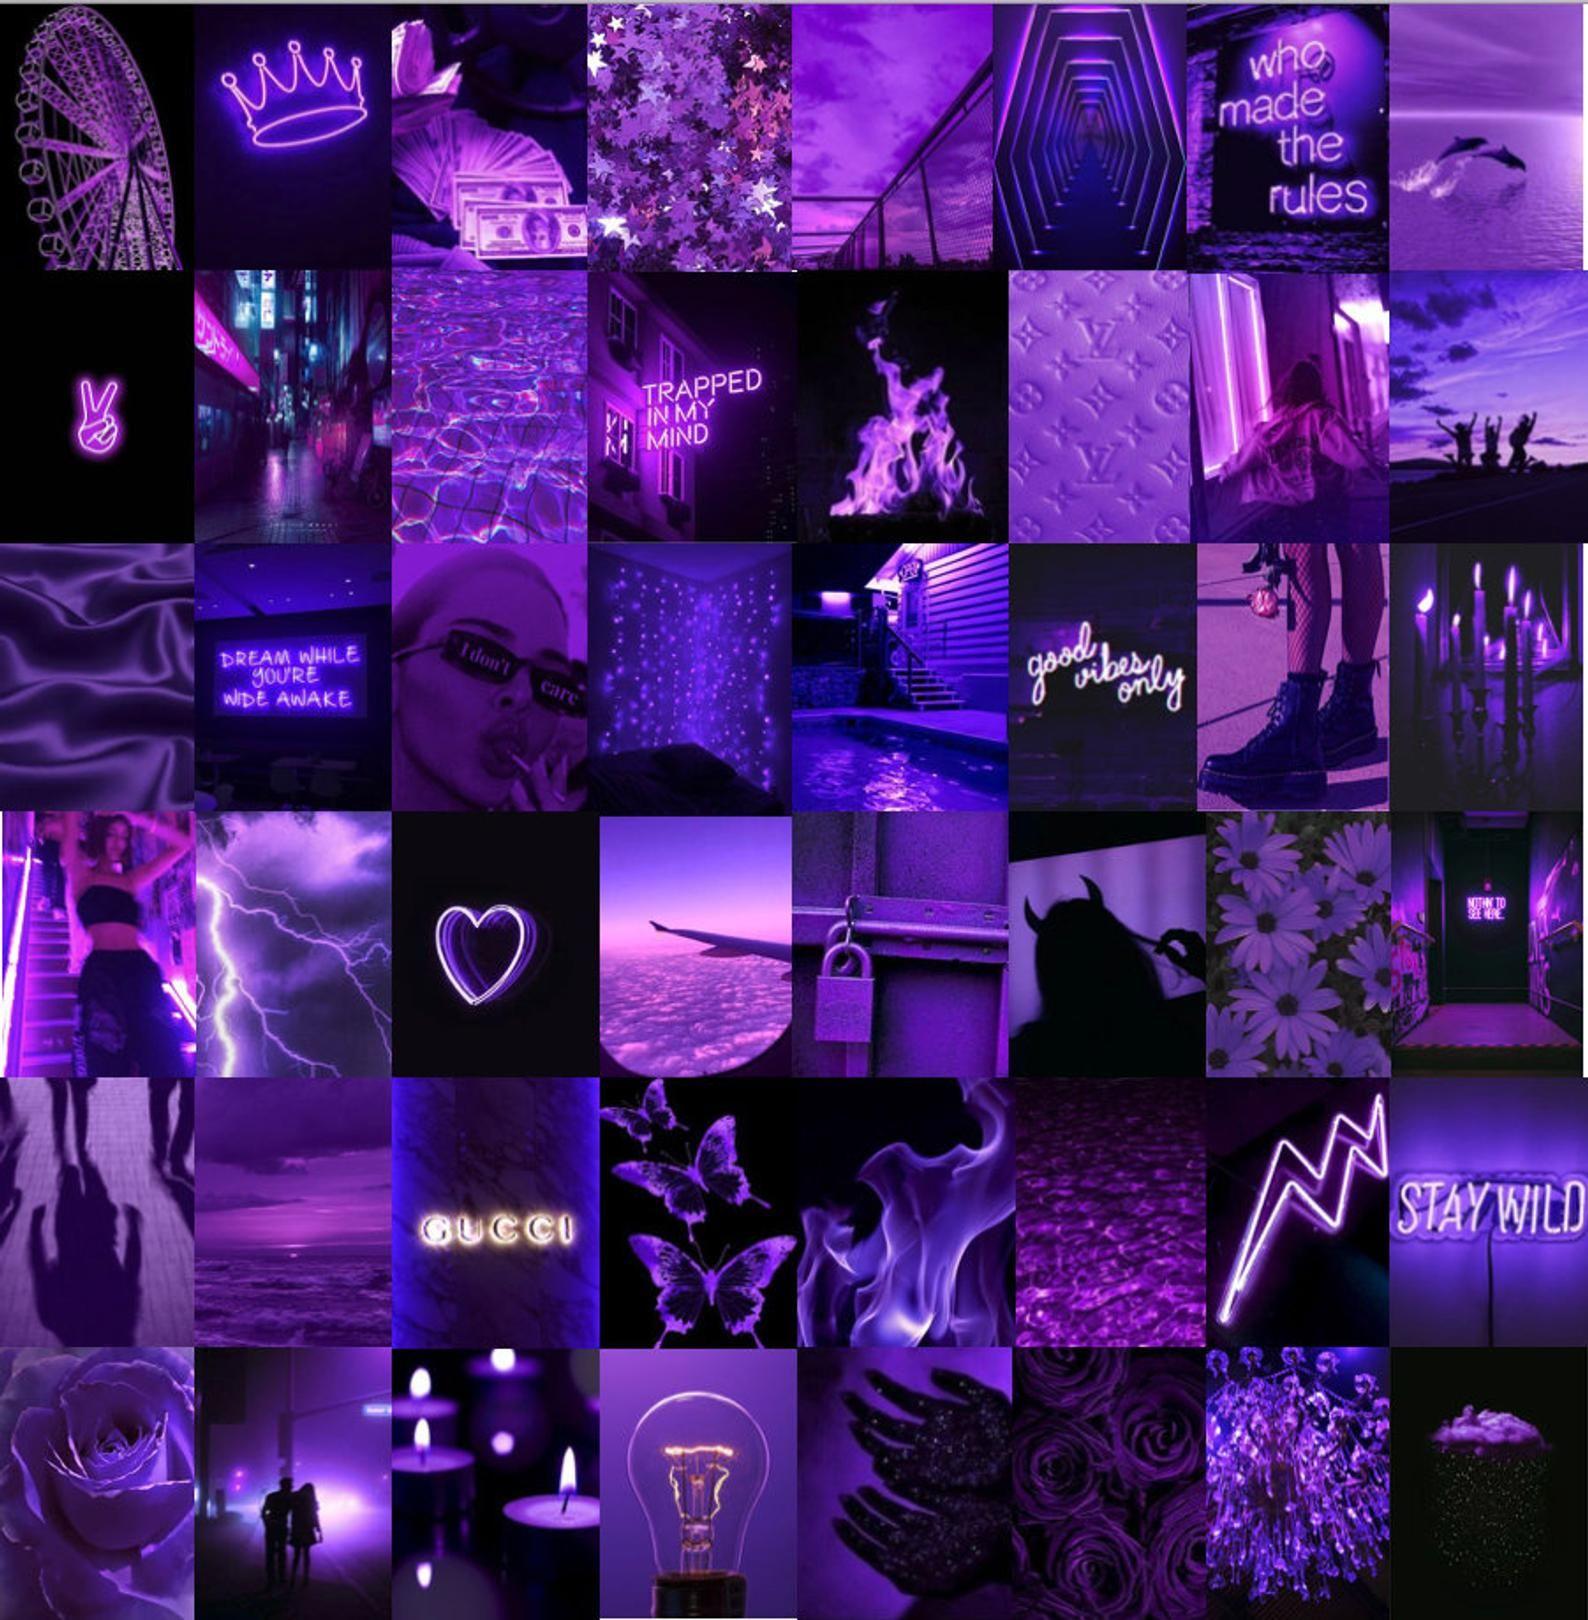 Neon Purple Aesthetic Photo Wall Collage Kit Etsy Morado Fluorescente Hacer Fondos De Pantalla Fondos De Pantalla Morados